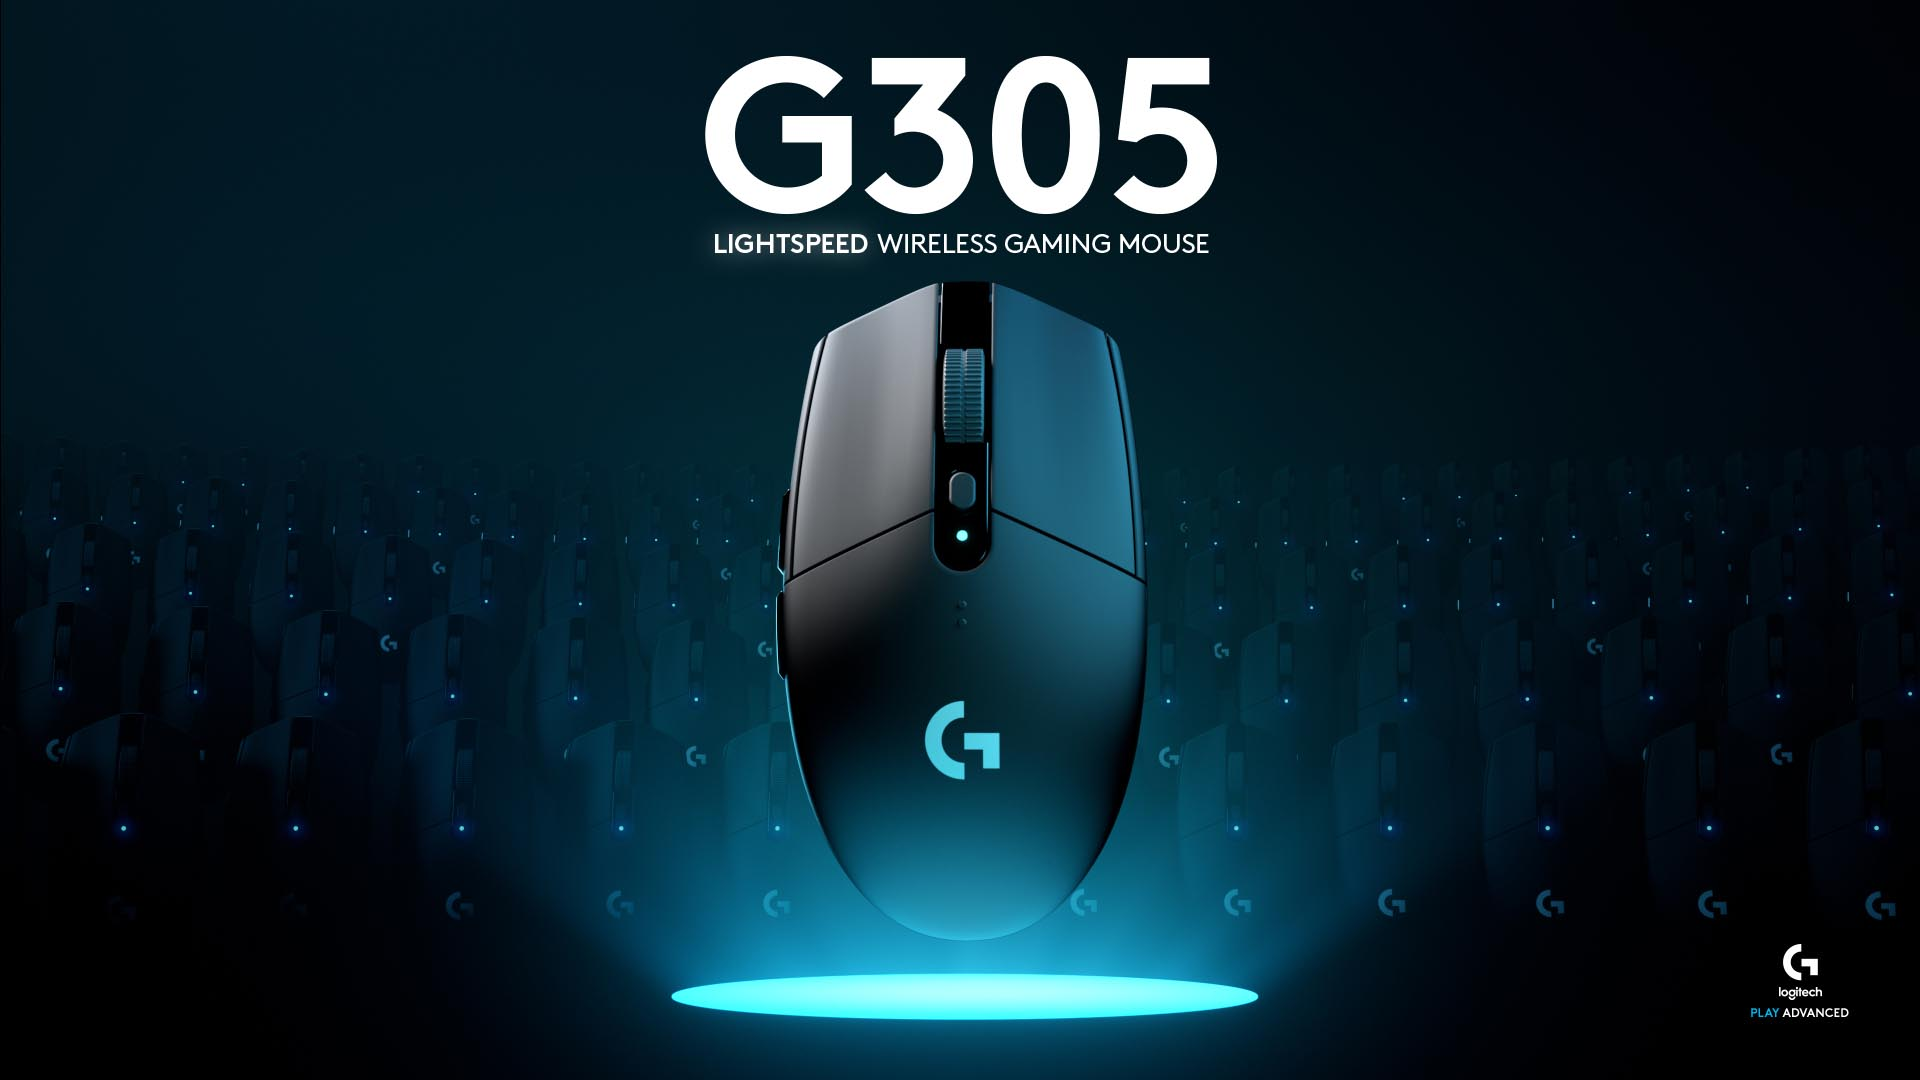 Logitech Presents G305 LIGHTSPEED Wireless Gaming Mouse